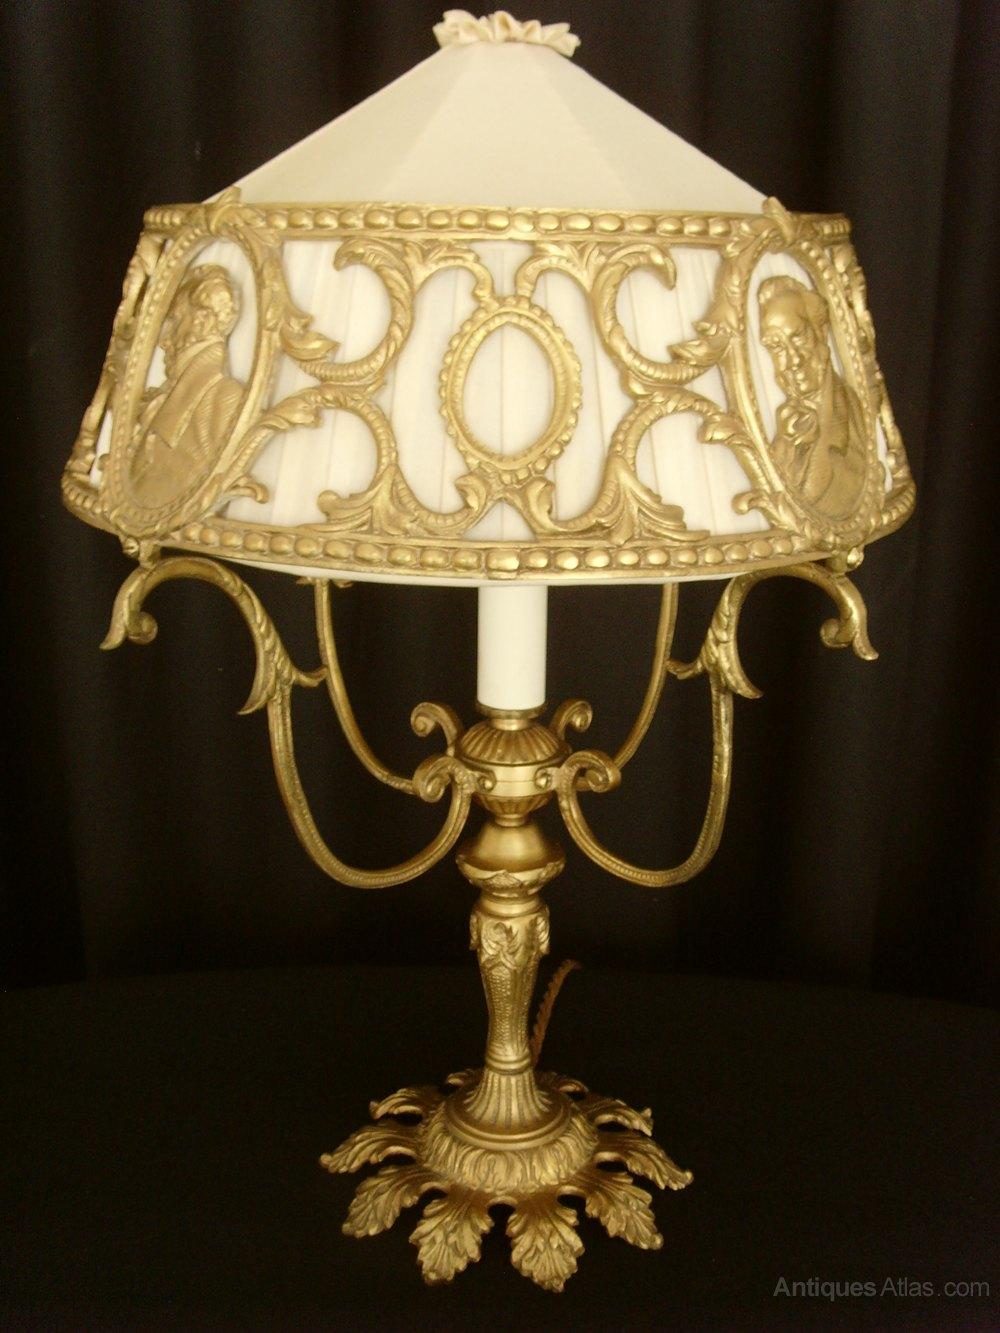 Antiques Atlas Unusual Gilt Metal Table Lamp Pierced Shade